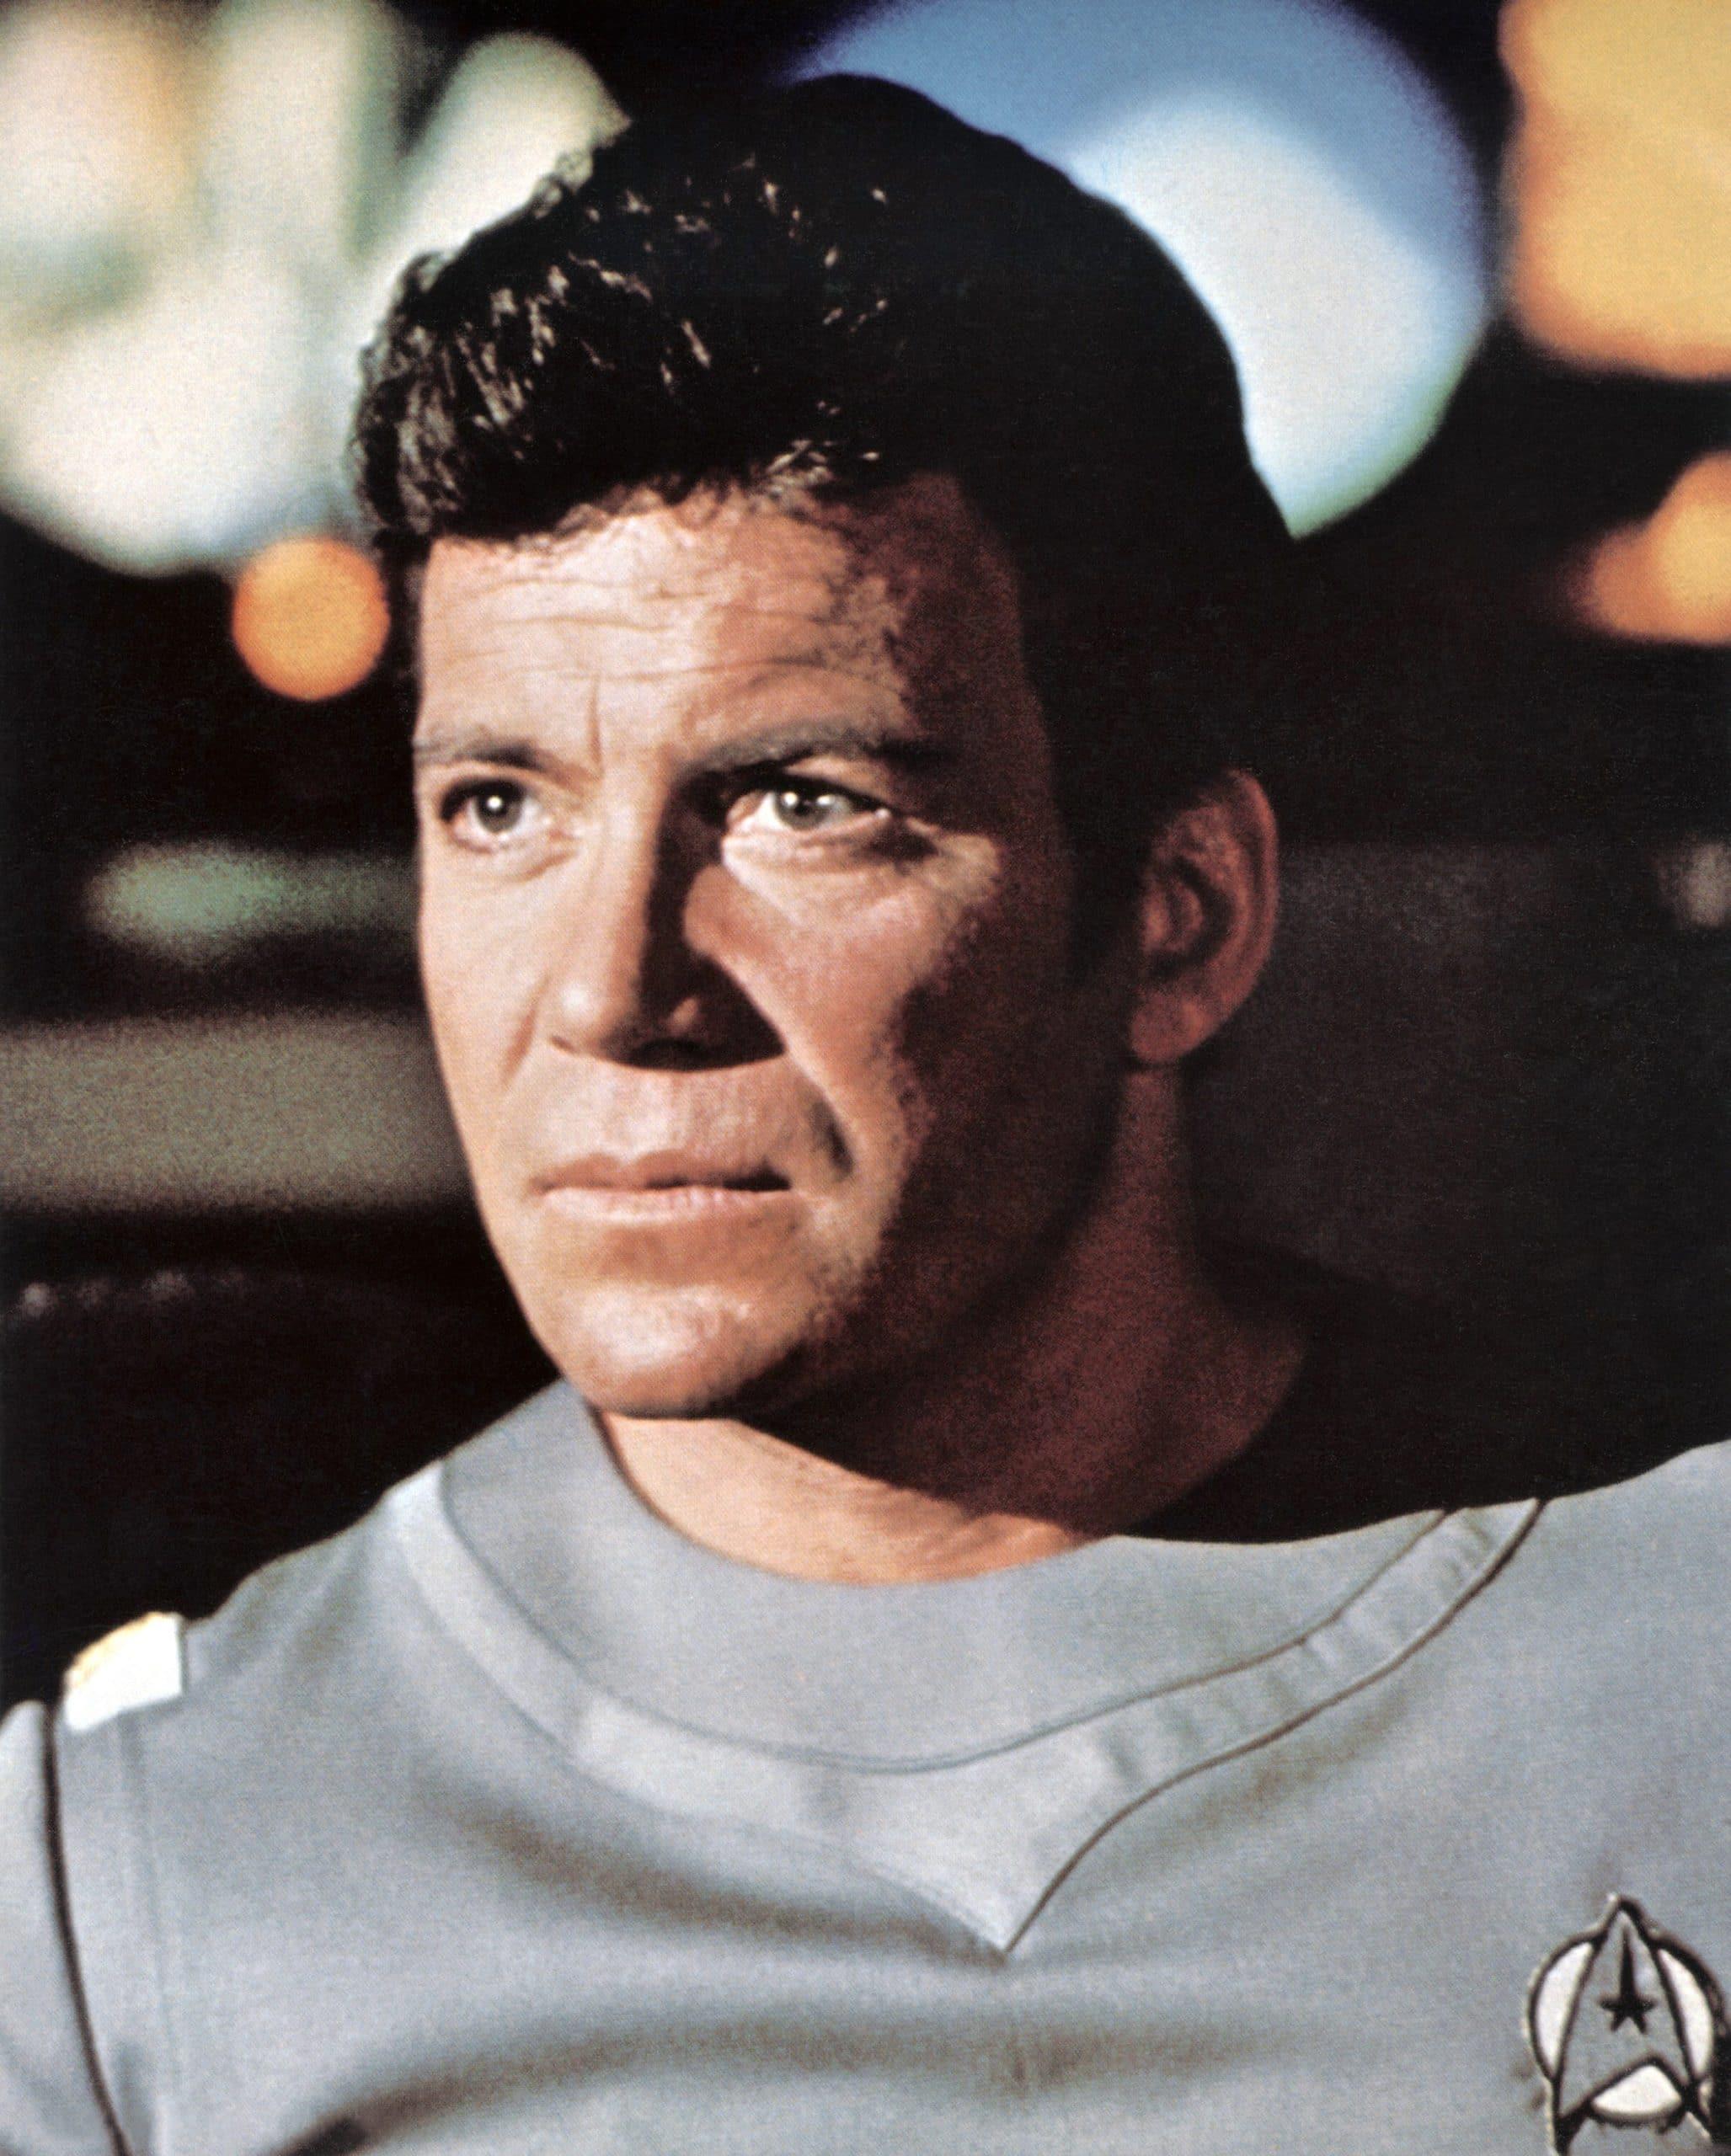 STAR TREK: THE MOTION PICTURE, William Shatner, 1979